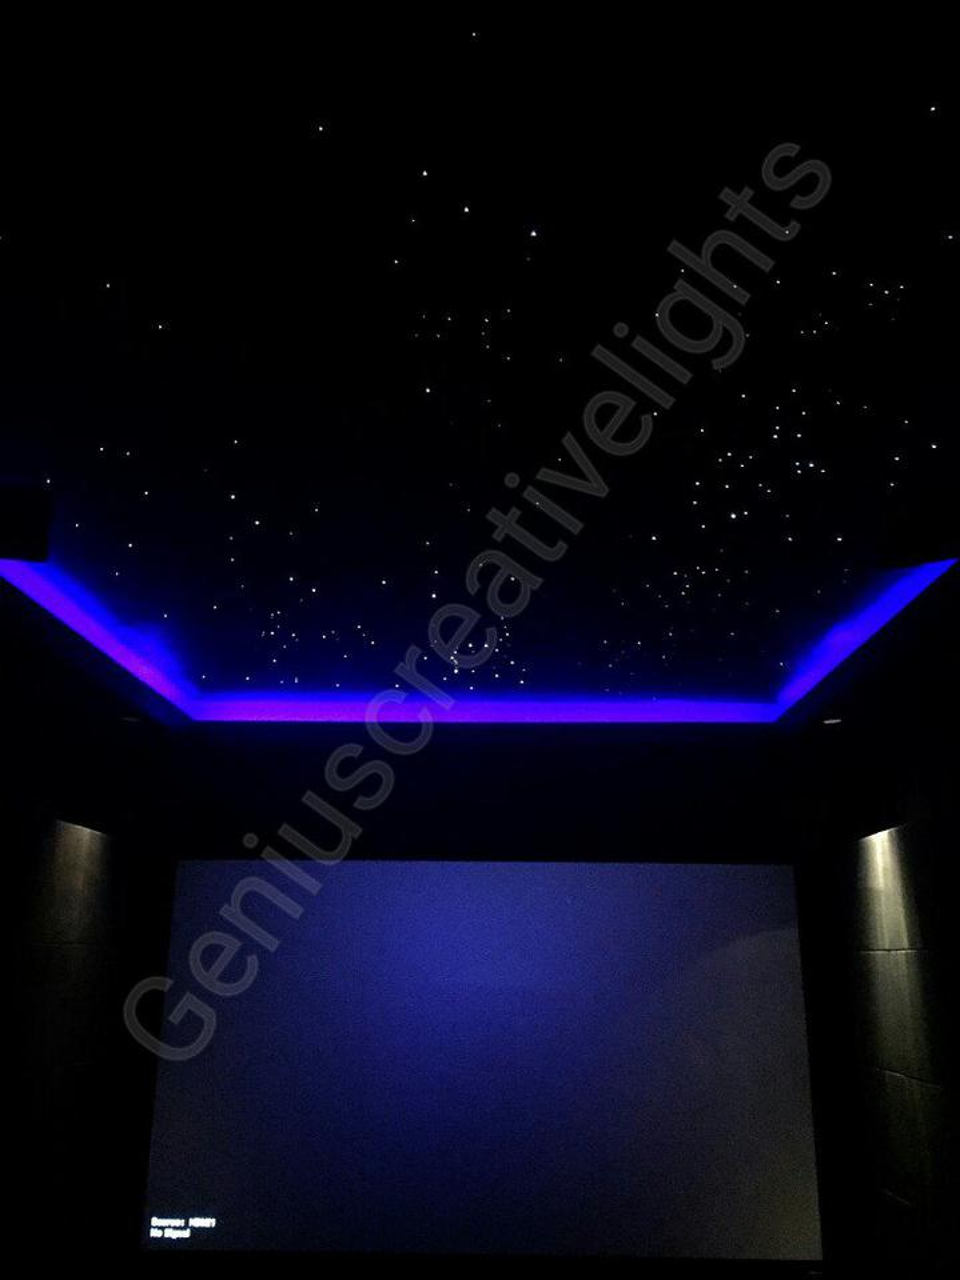 Fiber optic stars ceiling(ดาวบนฝ้าเพดาน) รูปที่ 2